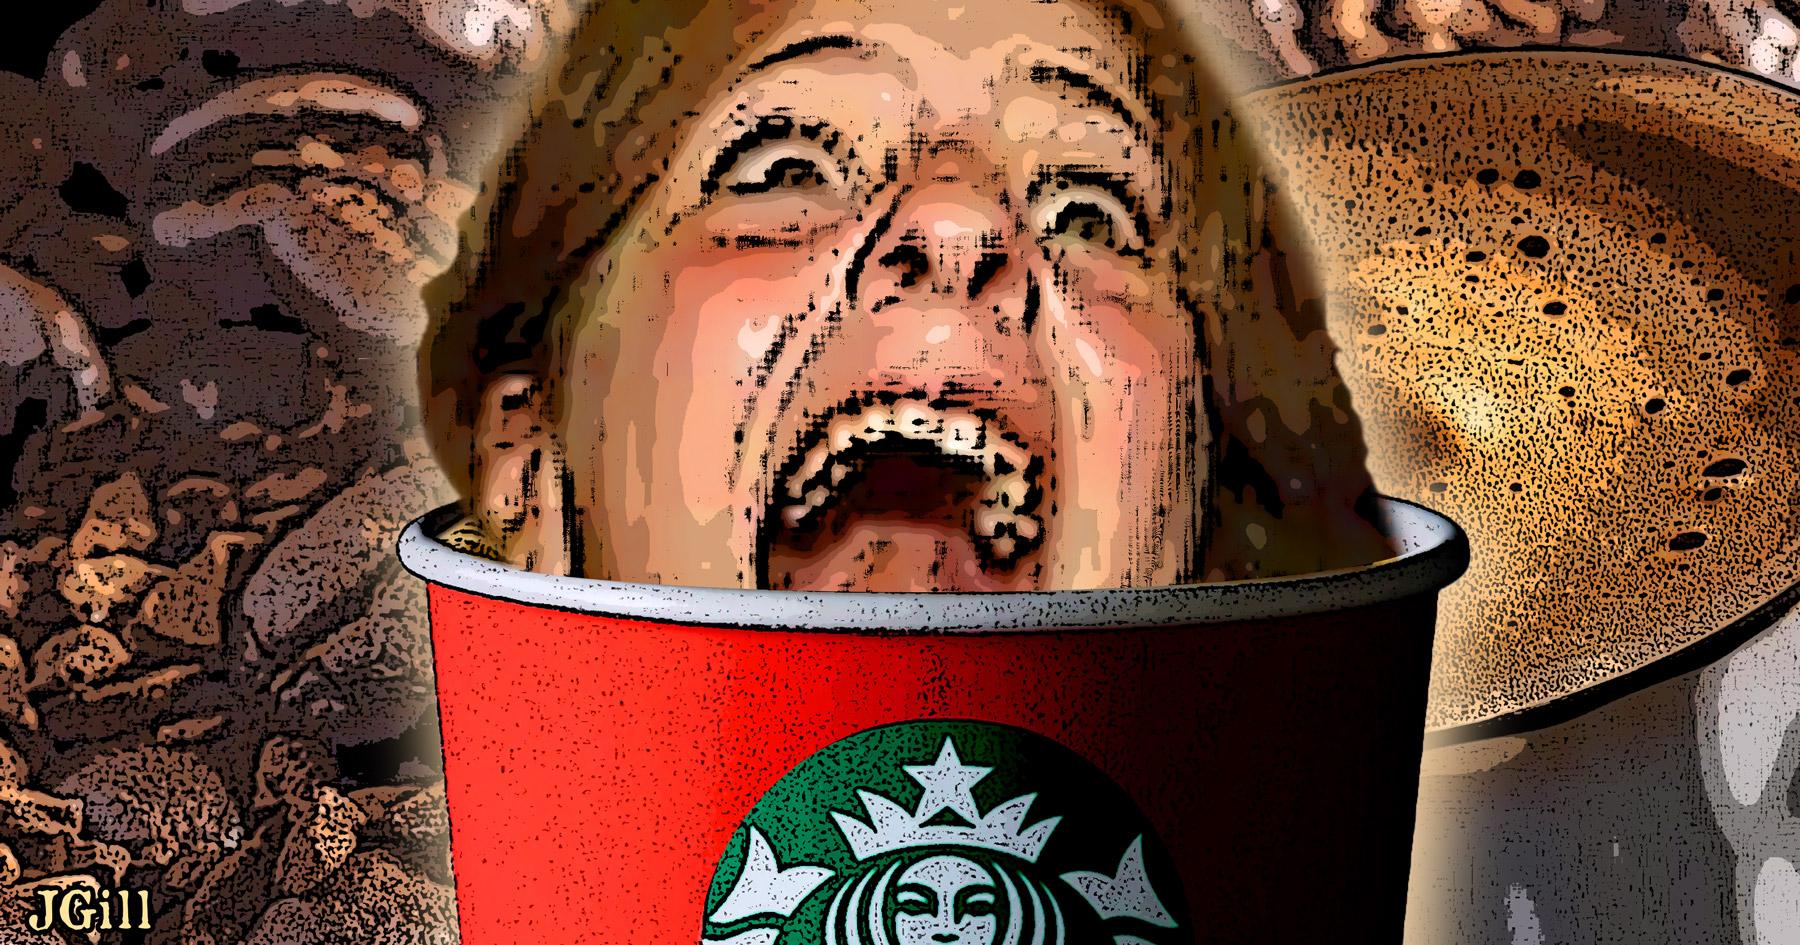 Starbucks, coffee, war on christmas, outrage, offense, folly, Common Sense